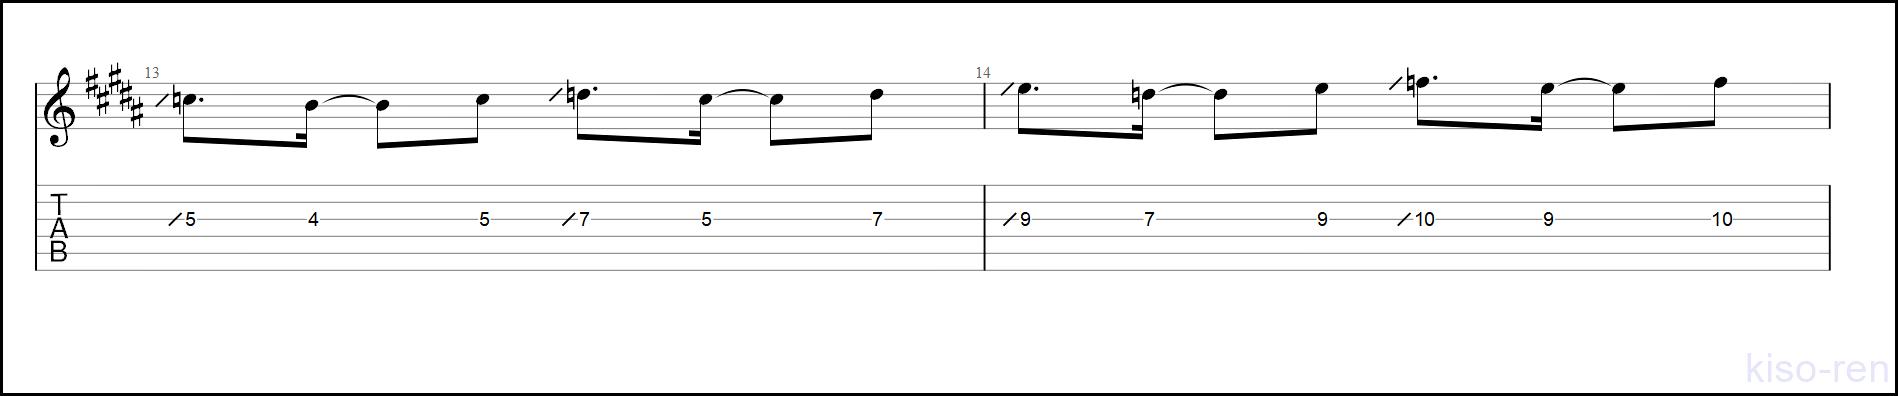 【TAB】紅(Kurenai) / X JAPAN Guitar solo hide+Pataのギターソロの練習【Picking ピッキング】